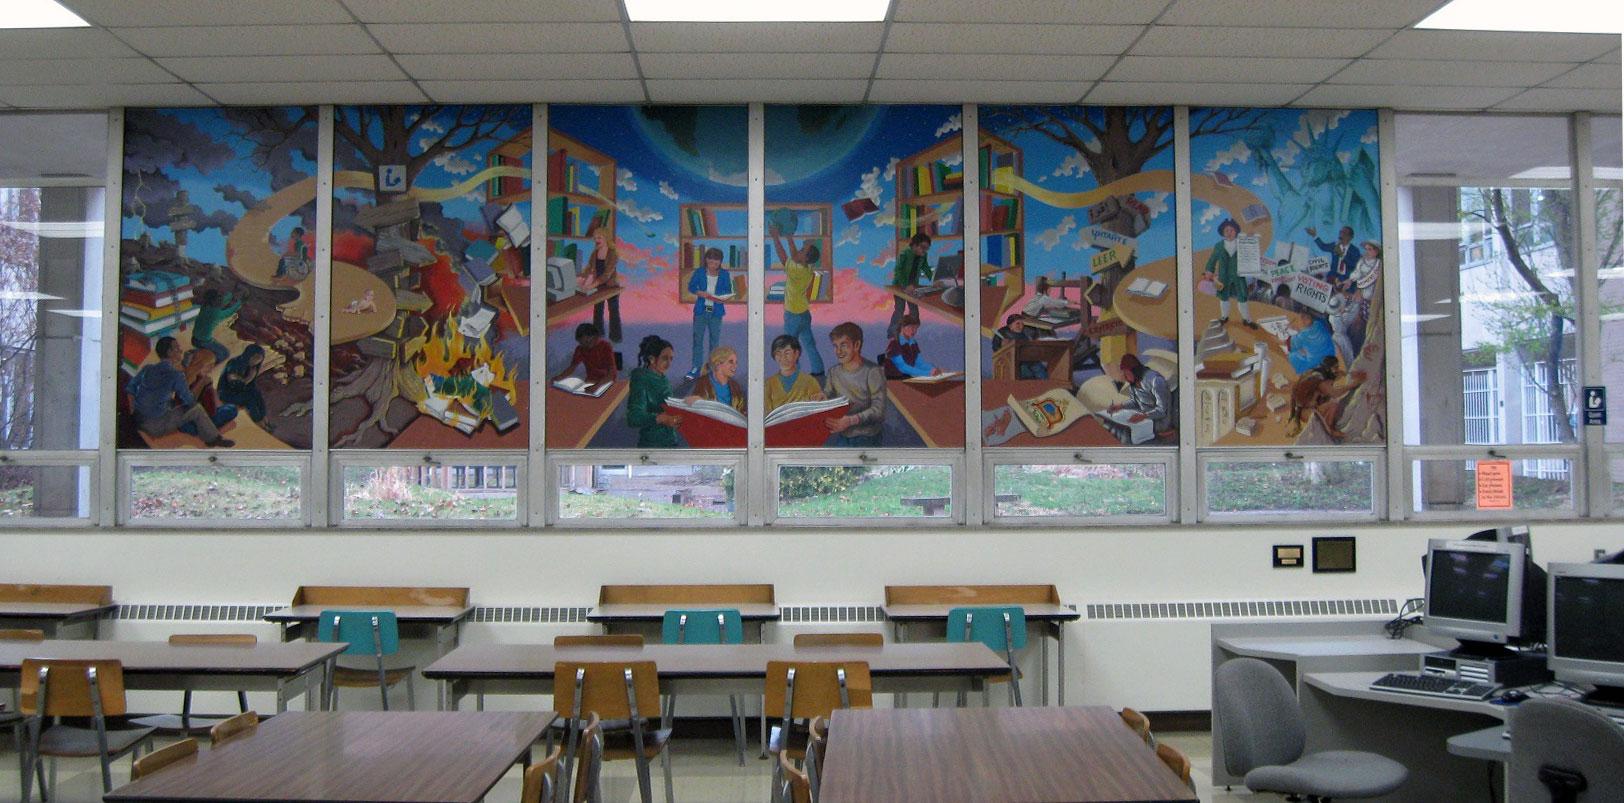 Educational_Murals_2.jpg